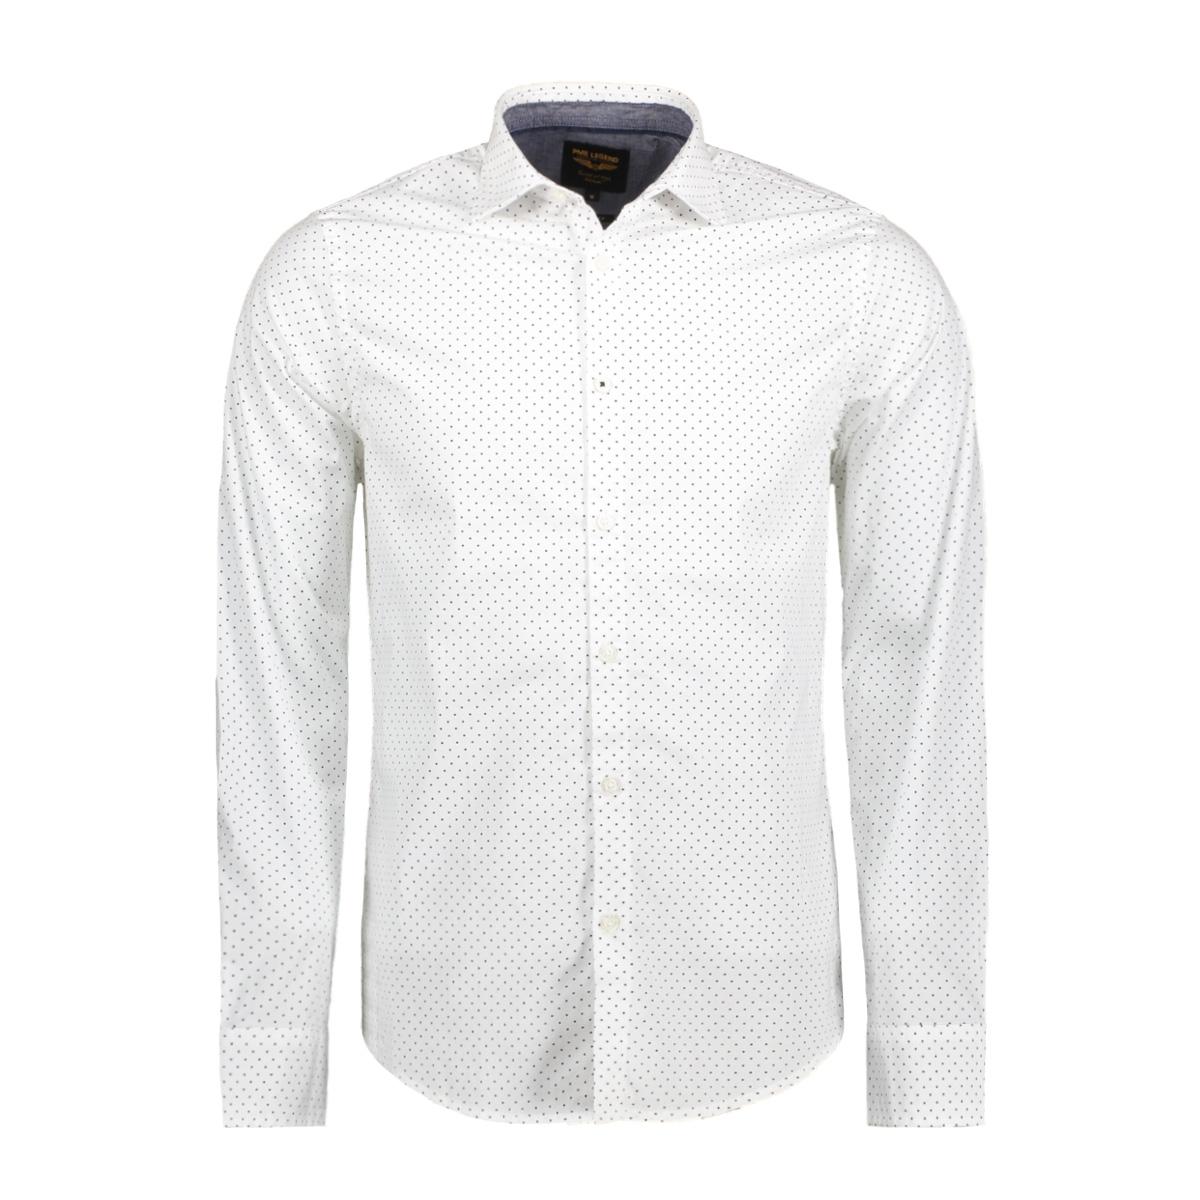 psi178223 pme legend overhemd 7003